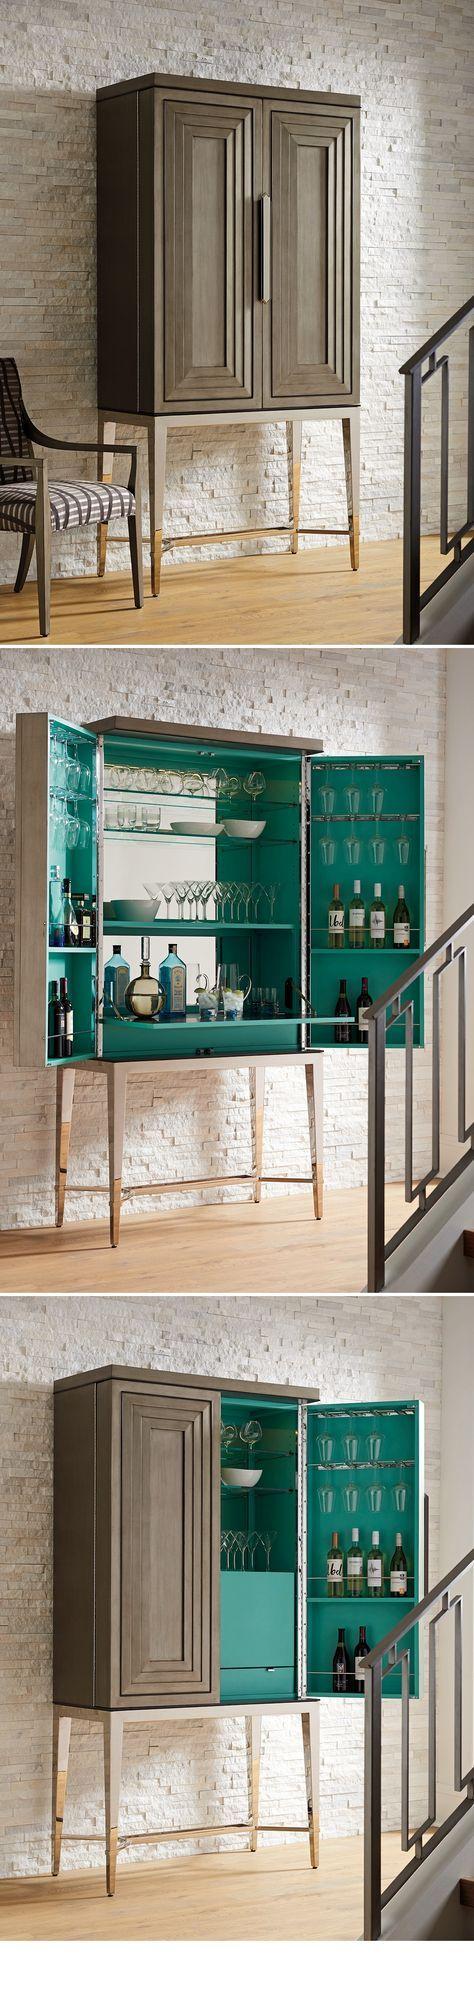 Beautiful Mini Bar with Stools